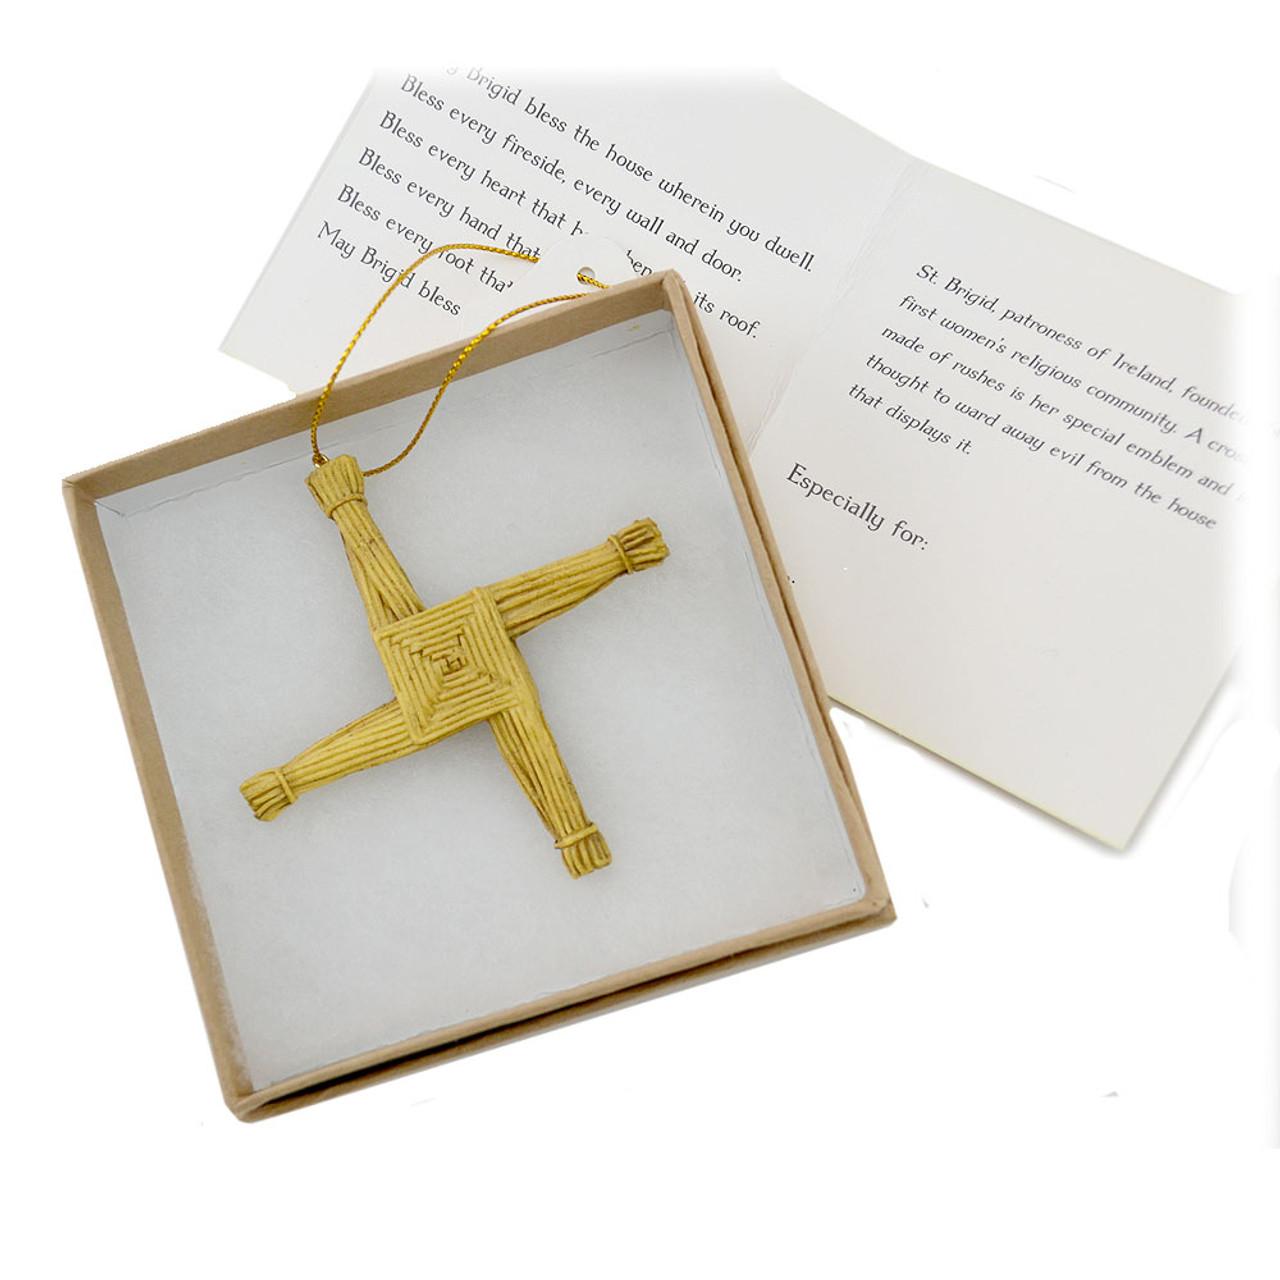 Ornament of St. Brigid's Cross